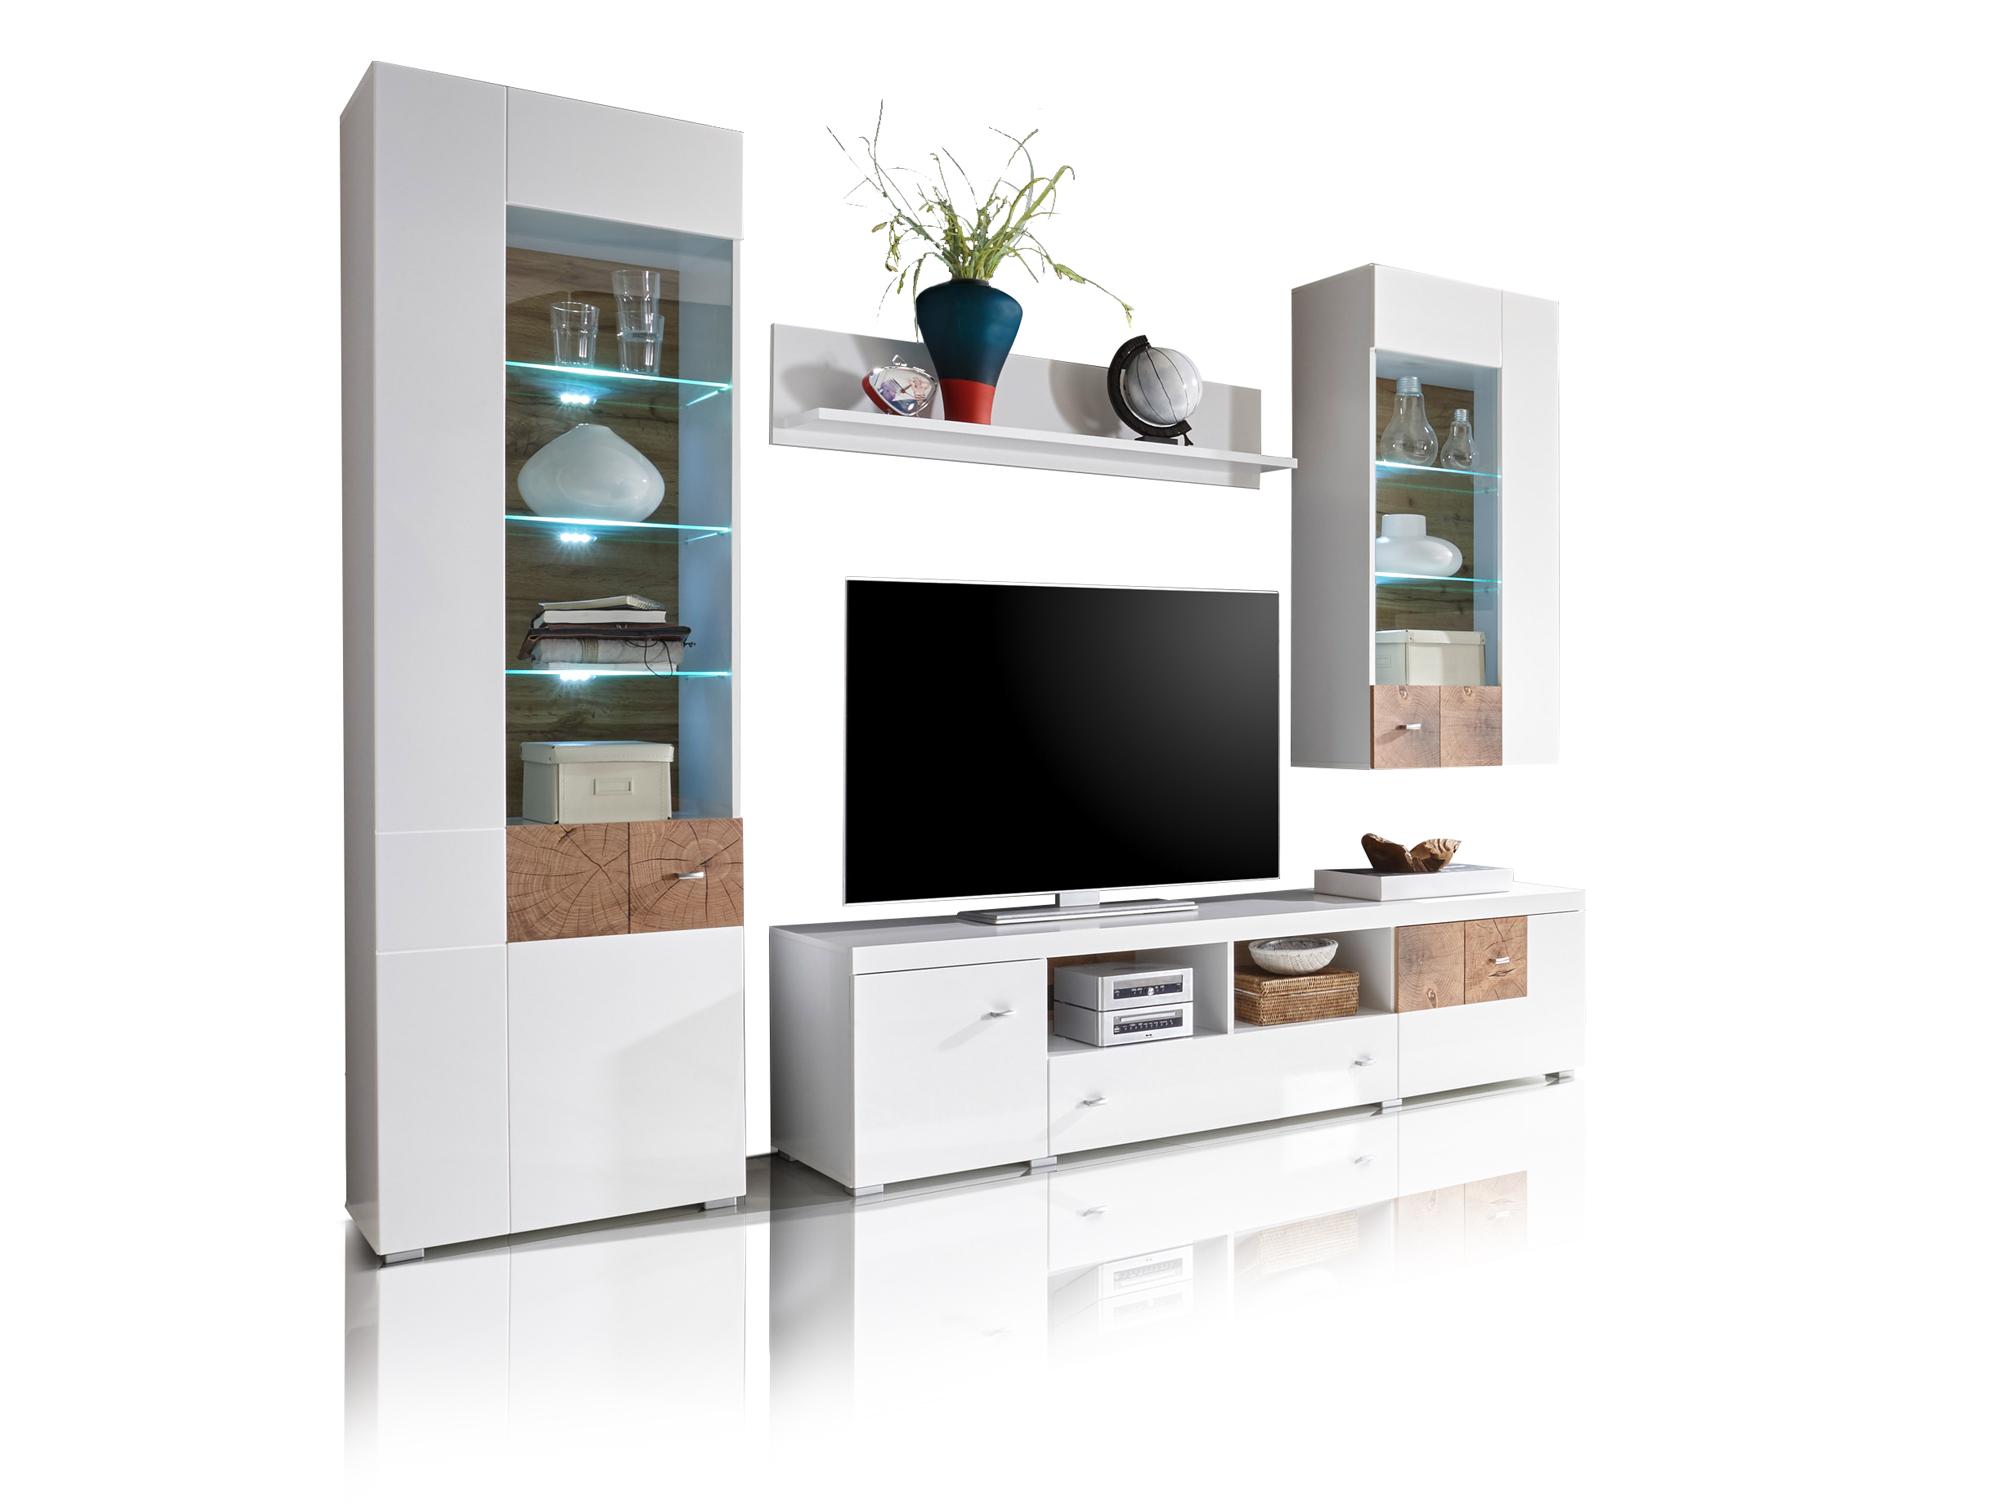 falka wohnwand wei hirnholz. Black Bedroom Furniture Sets. Home Design Ideas